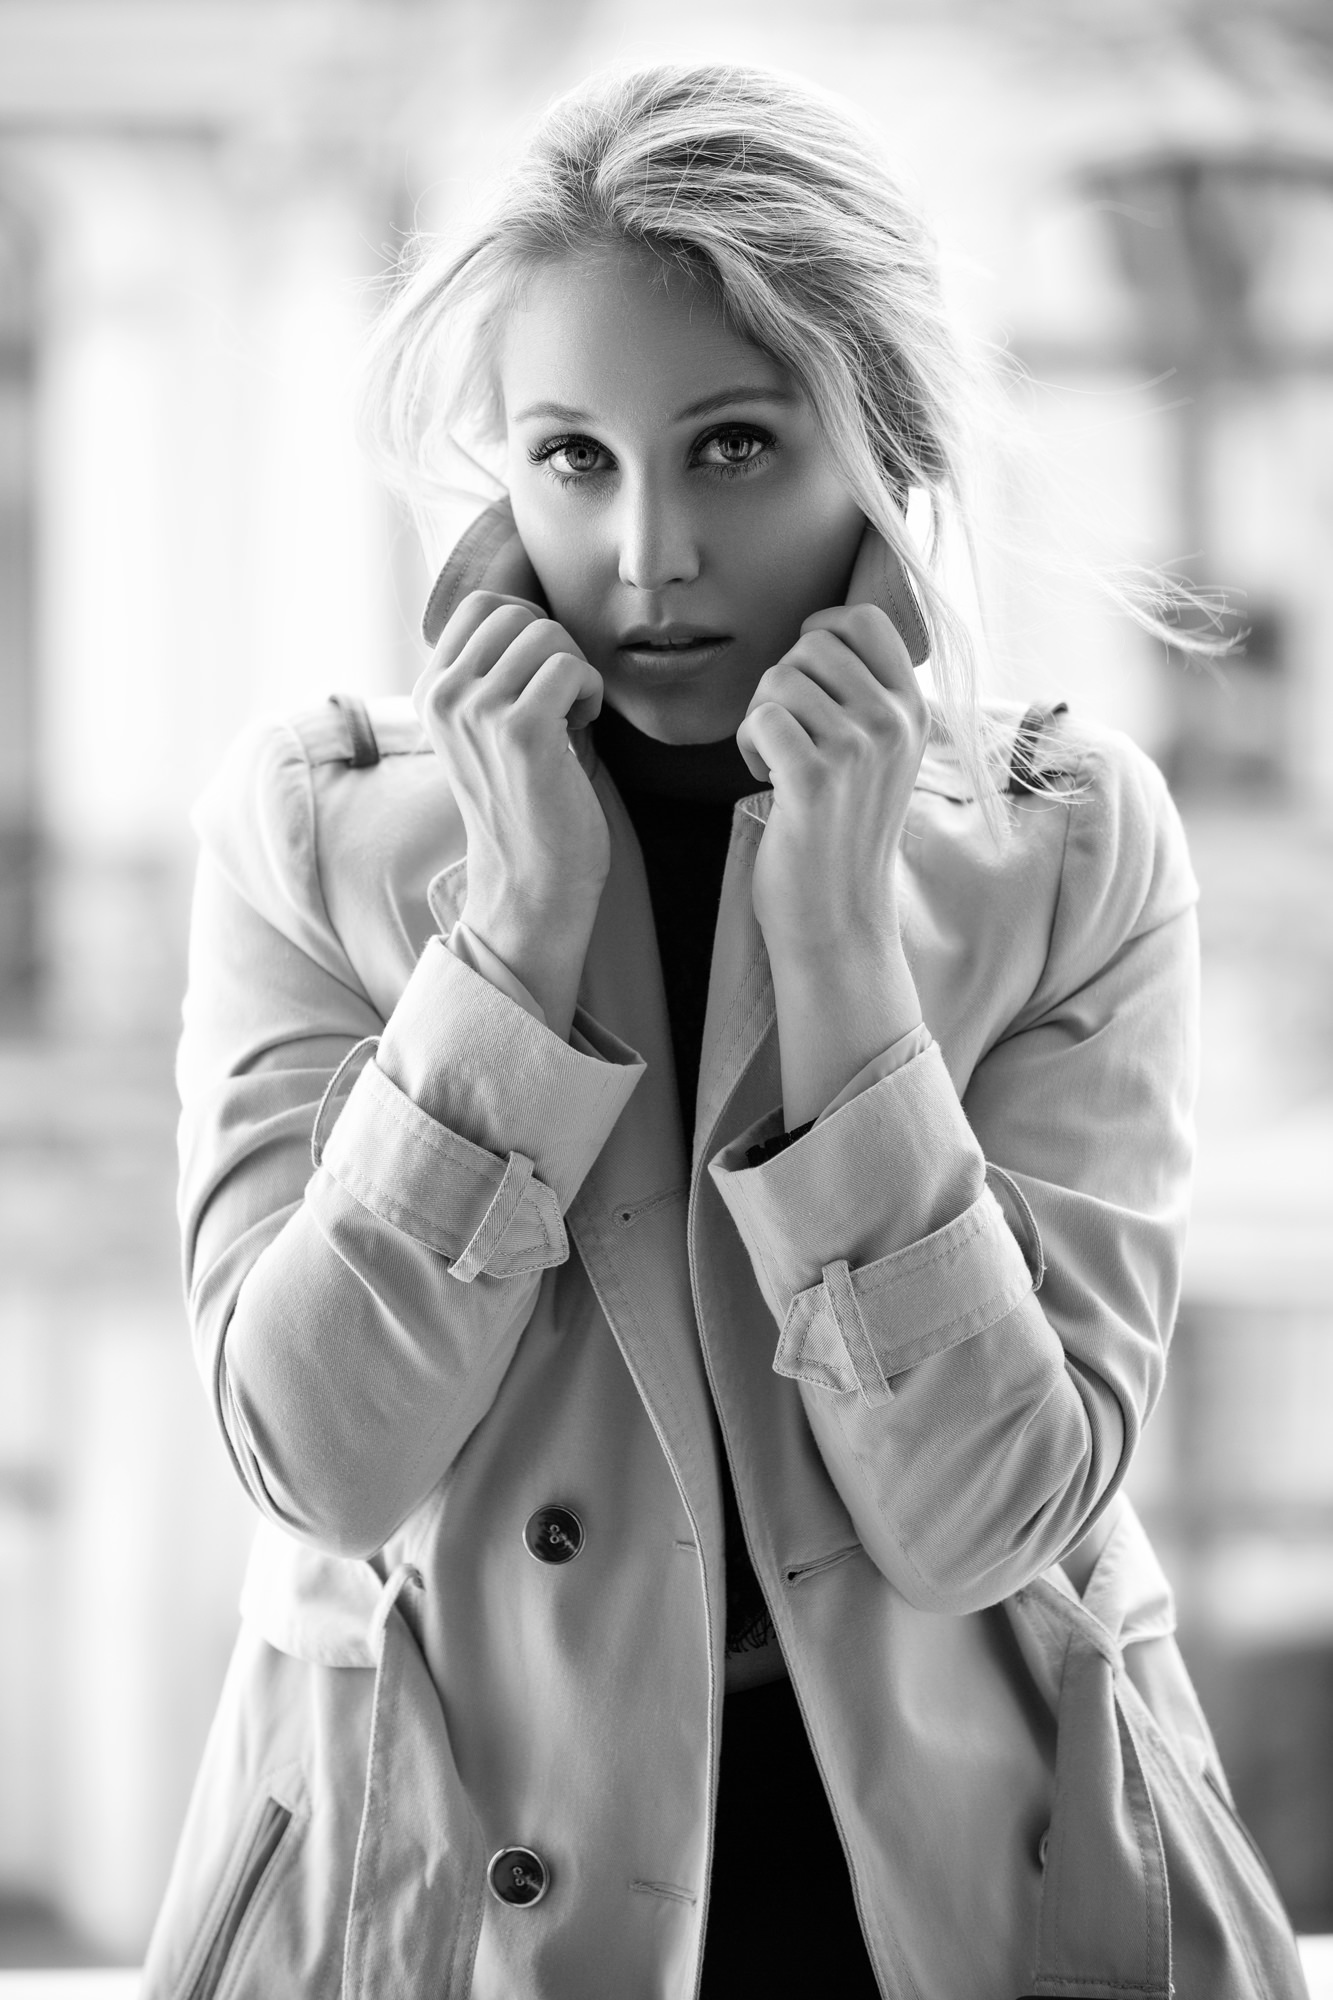 Portrait - Markus Hertzsch - B&W - Girl - Model - Bildlook - Face - Pose - Art - Hair - Eyes - Angelina - Balcony - Blonde - Legs